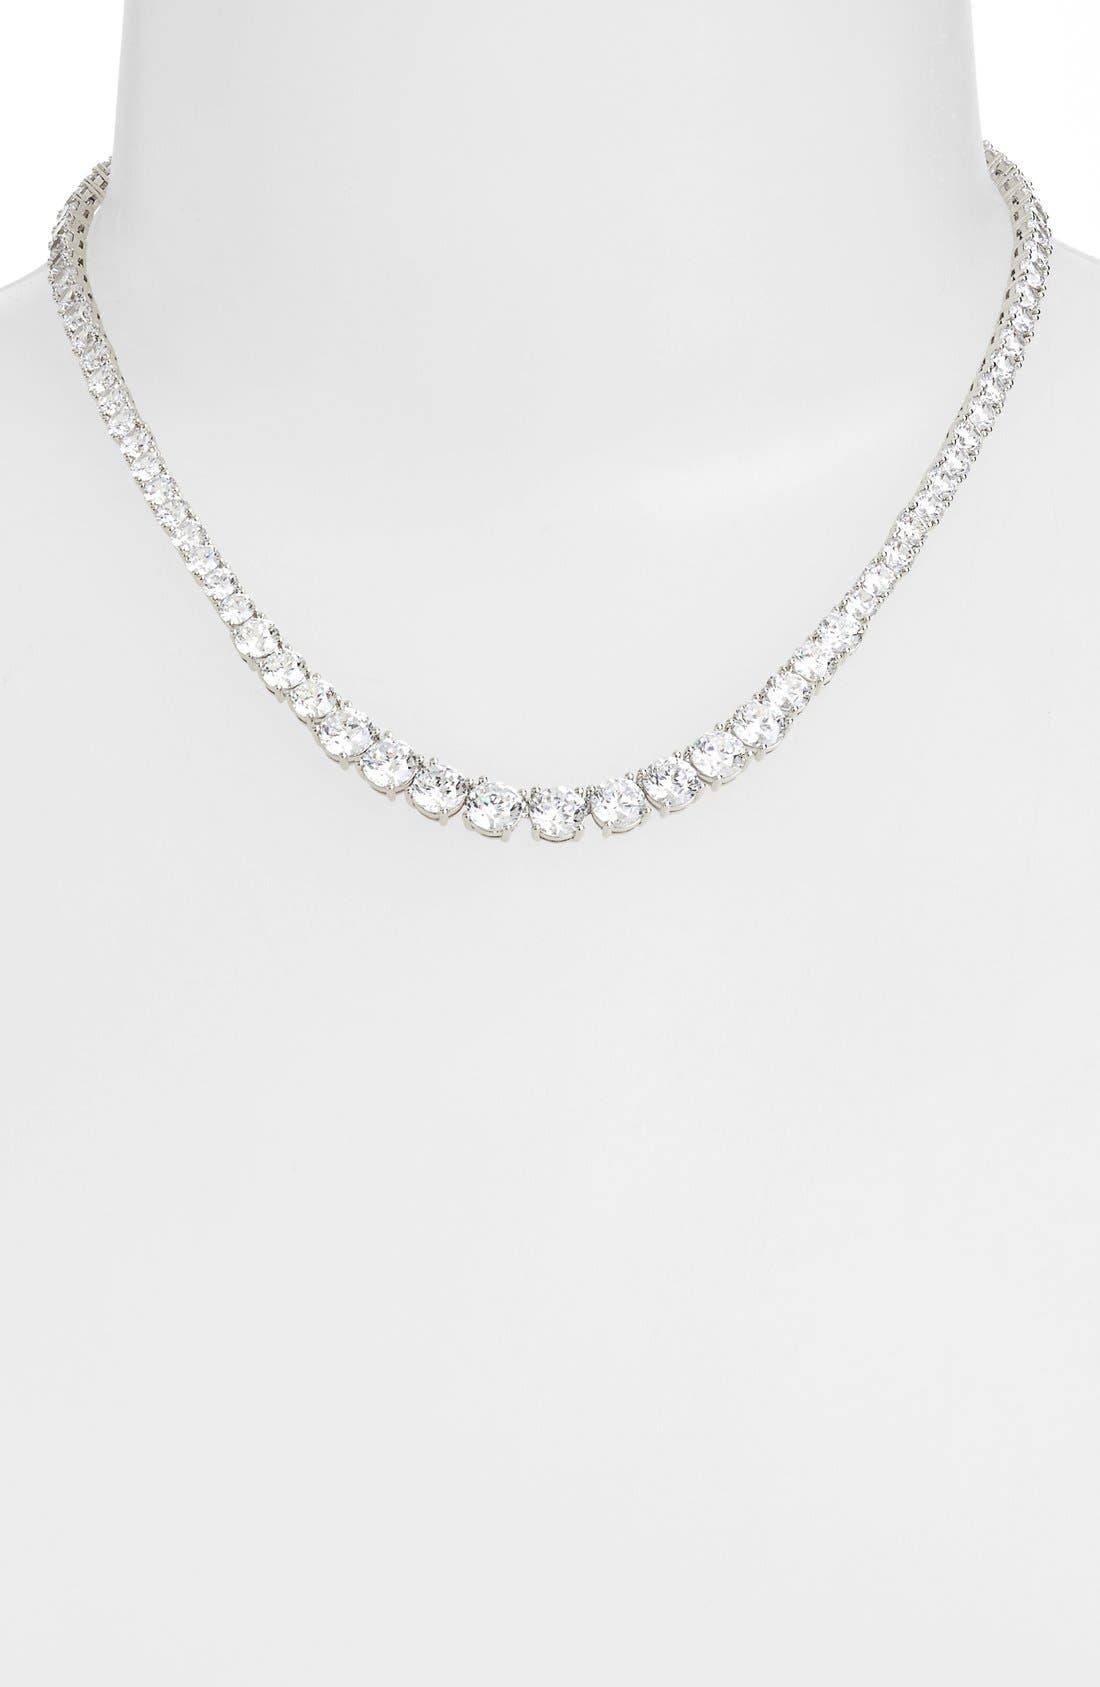 Cubic Zirconia Collar Necklace,                             Main thumbnail 1, color,                             SILVER